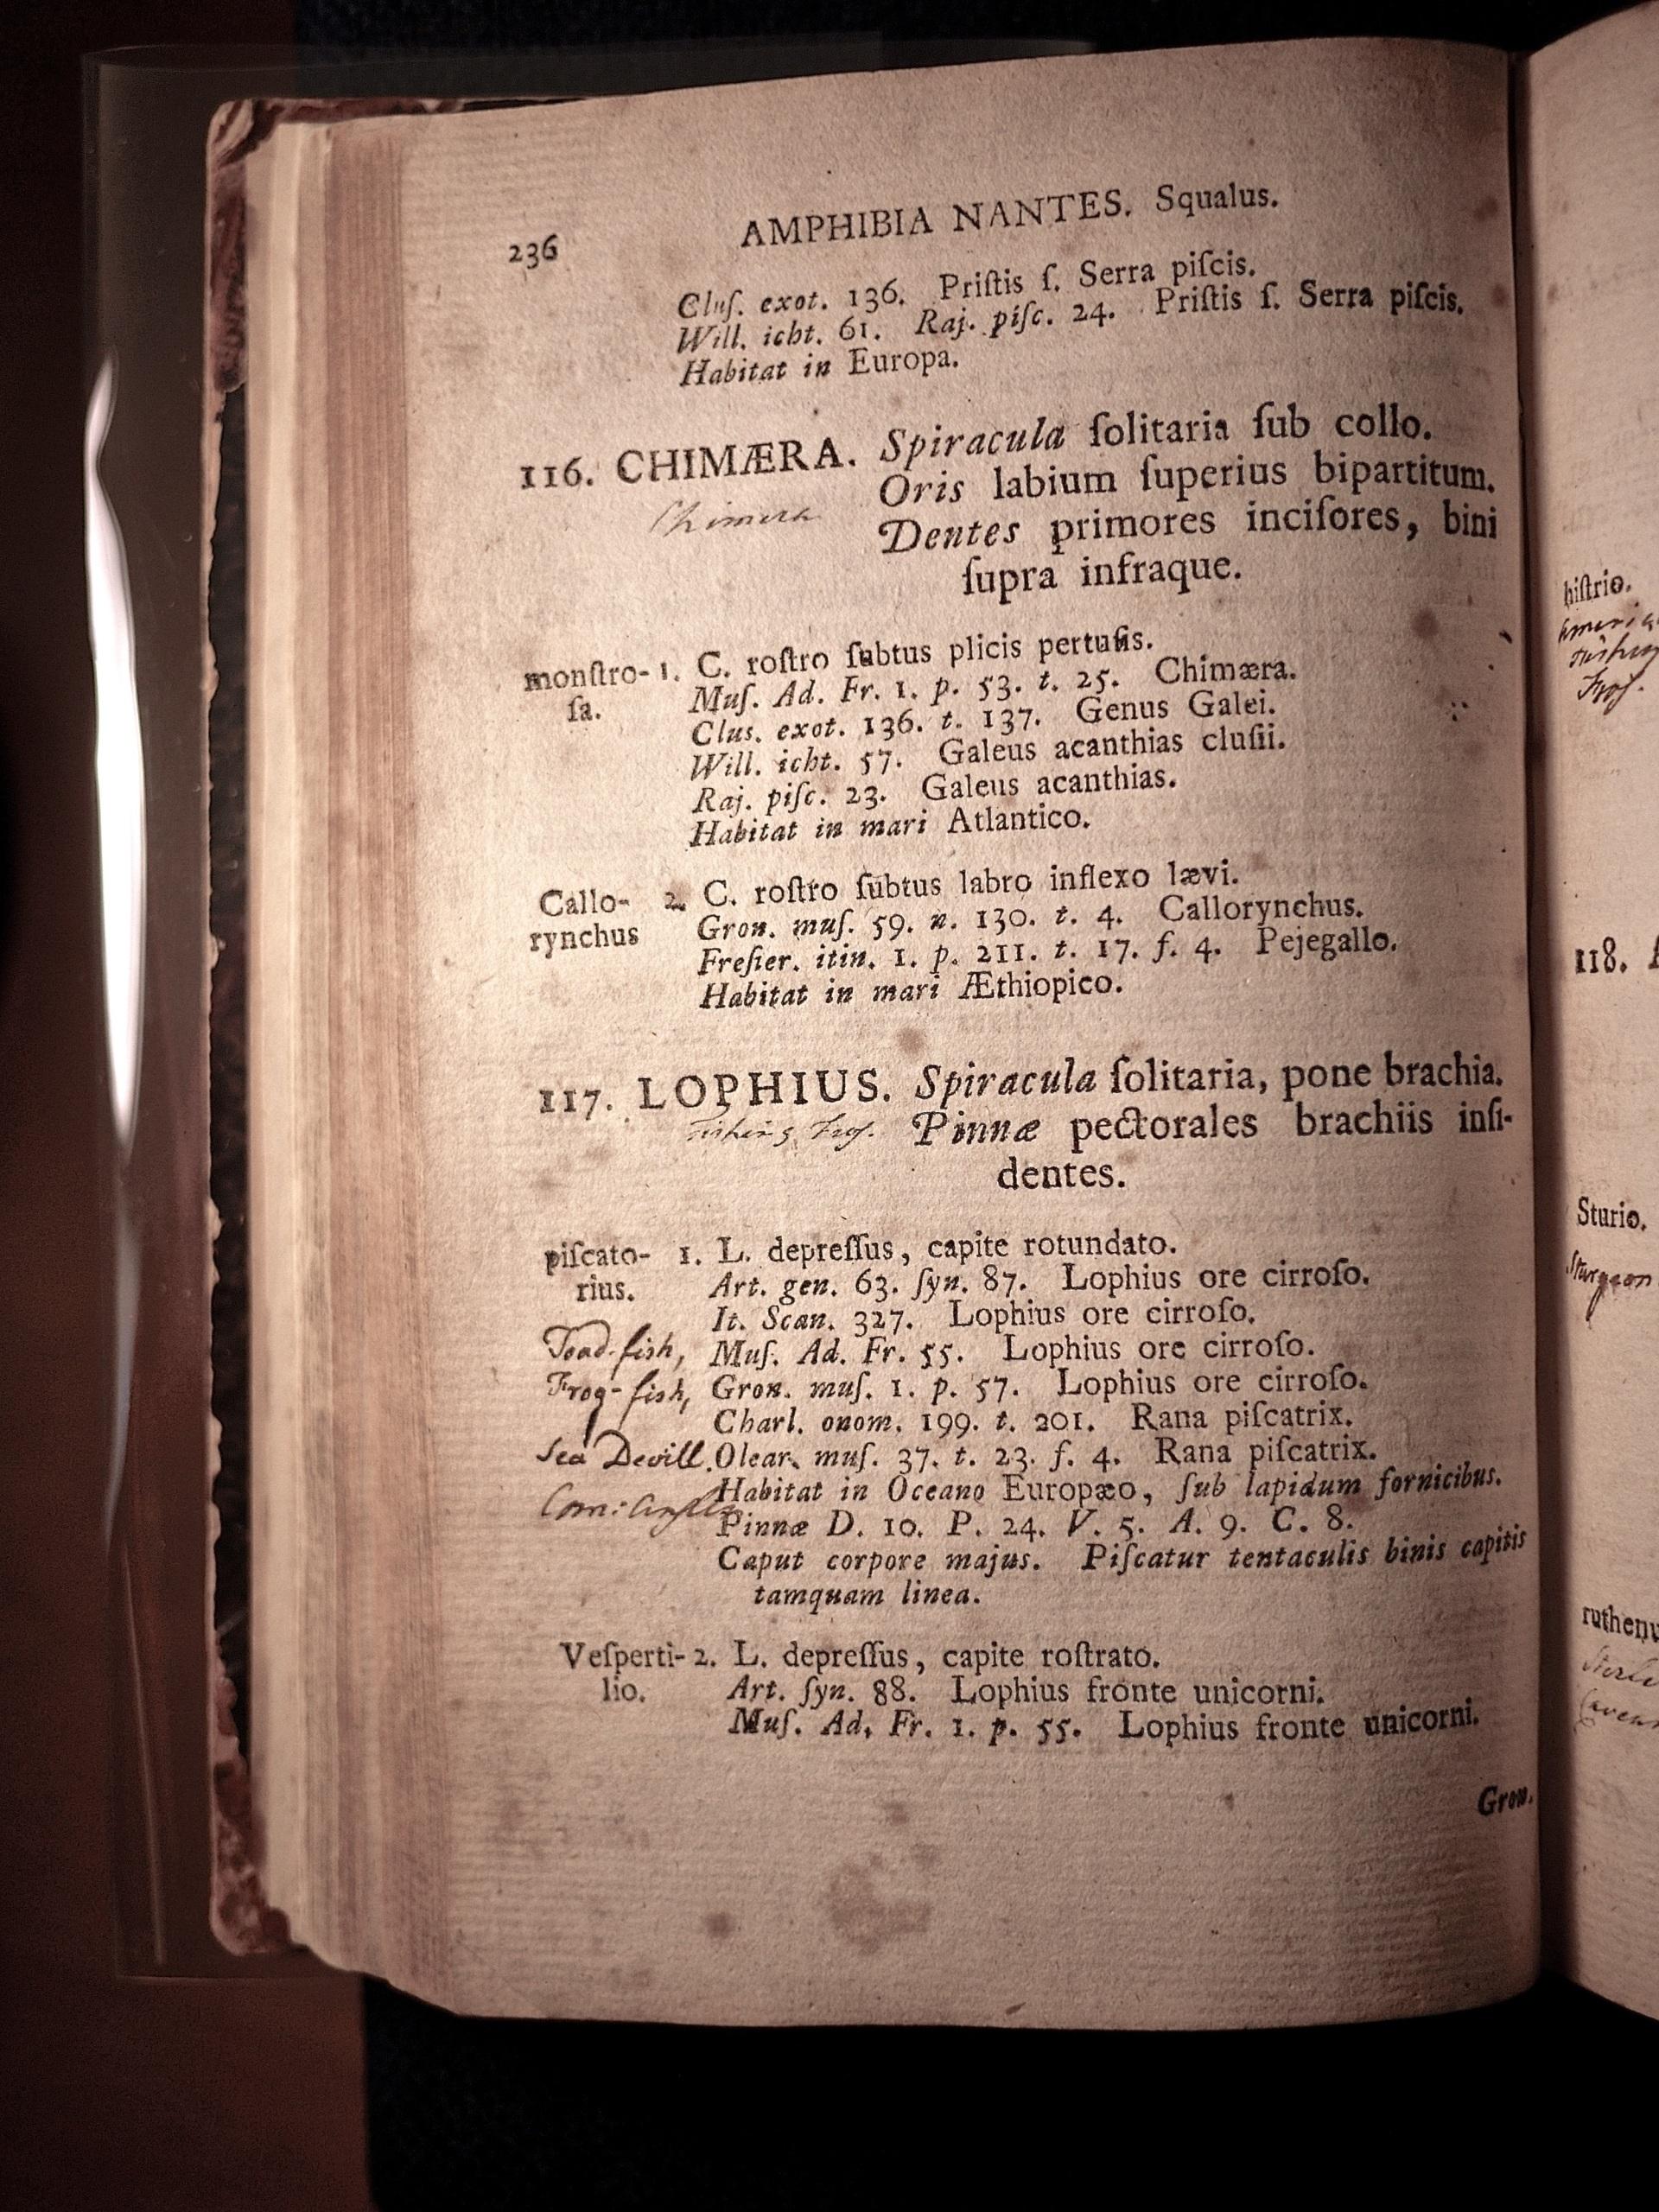 Linnaeus-Biblio